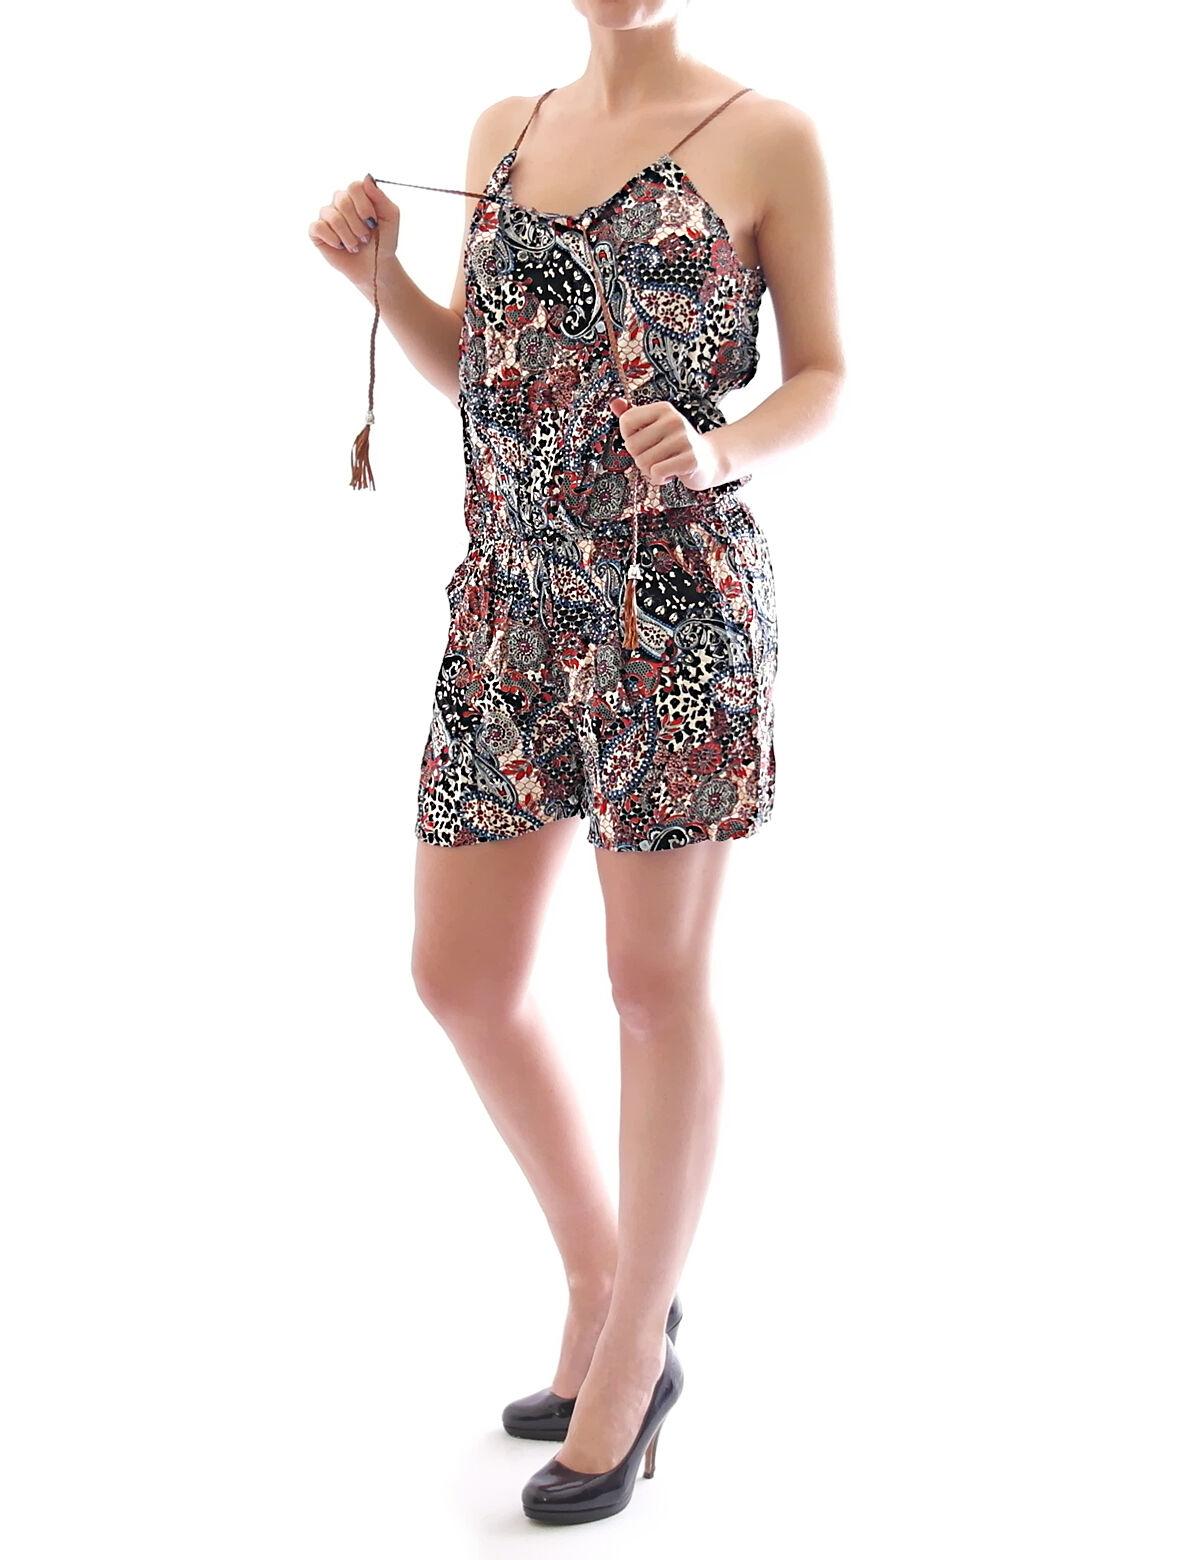 damen overall einteiler shorts kurze hose jumpsuit catsuit kleid mini a09